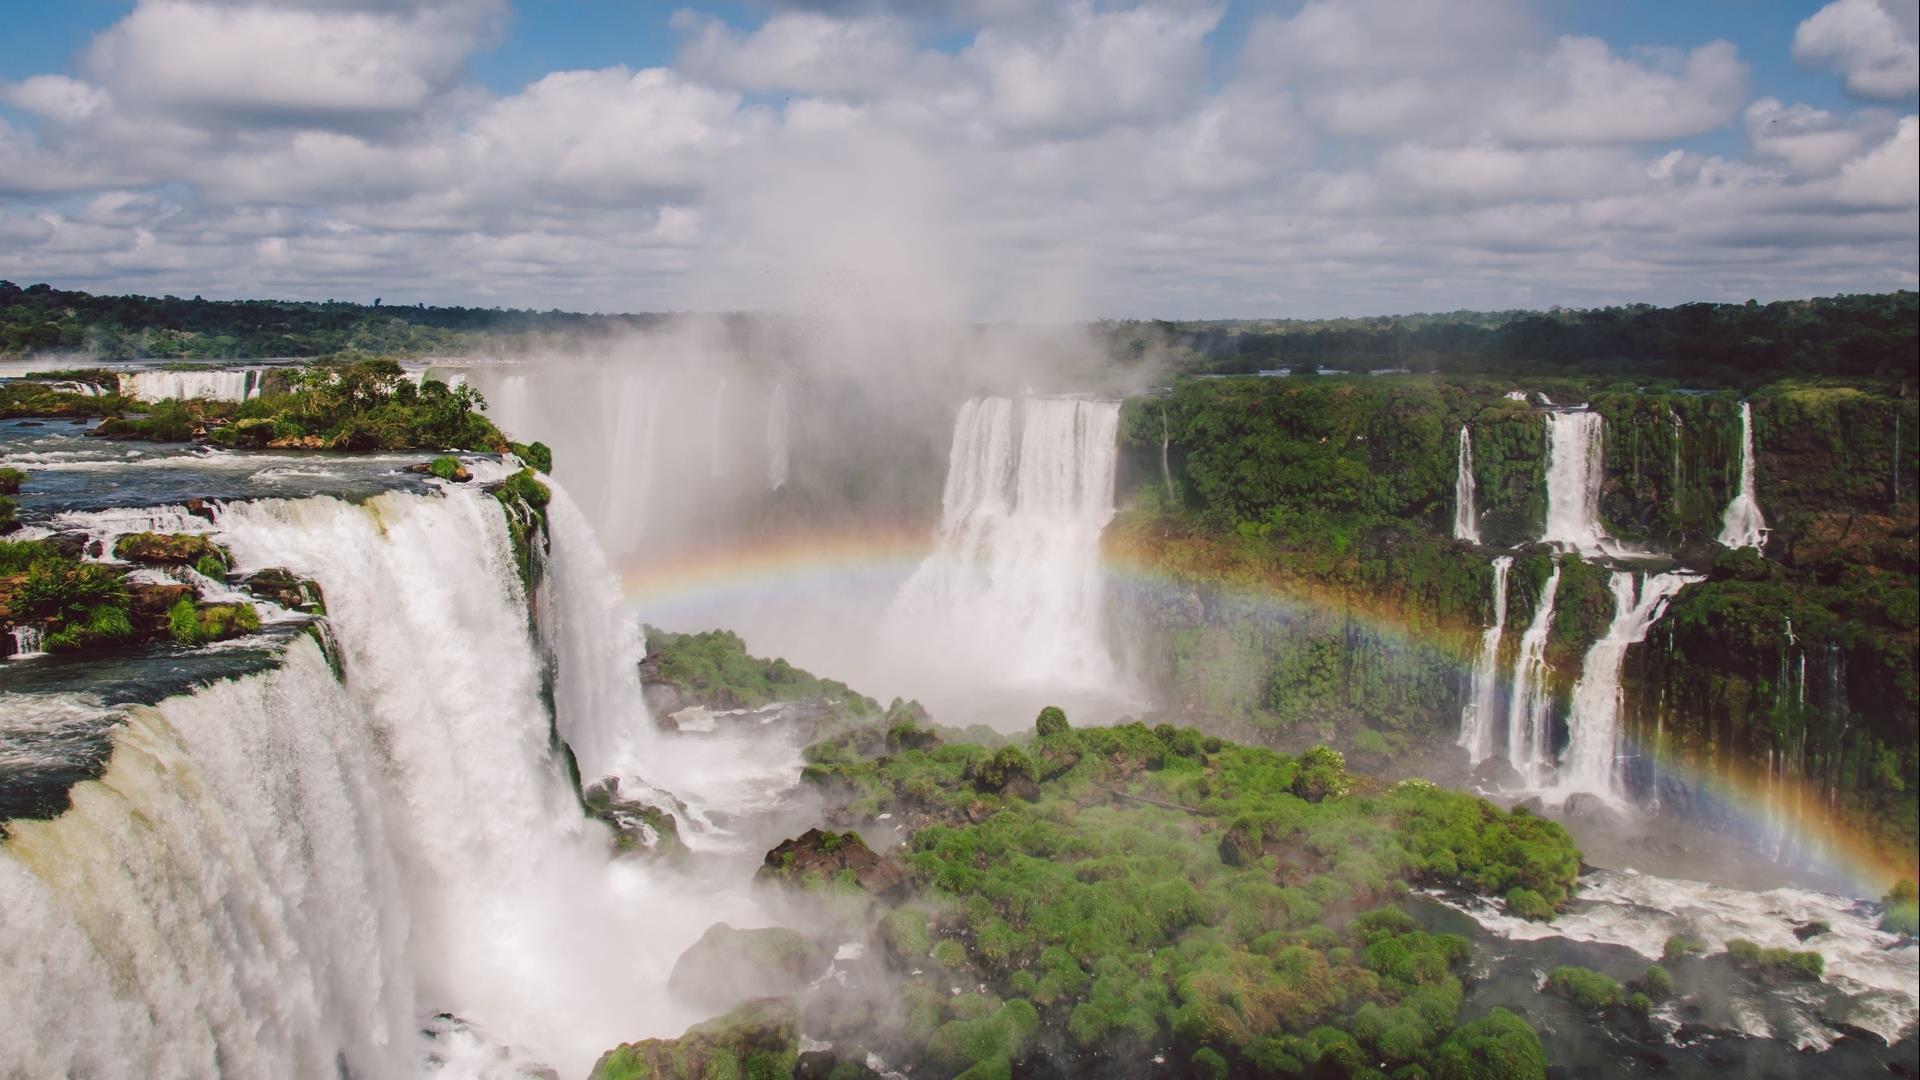 Iguacu, Iguazu, Iguassu Waterfalls, from the Argentinan side